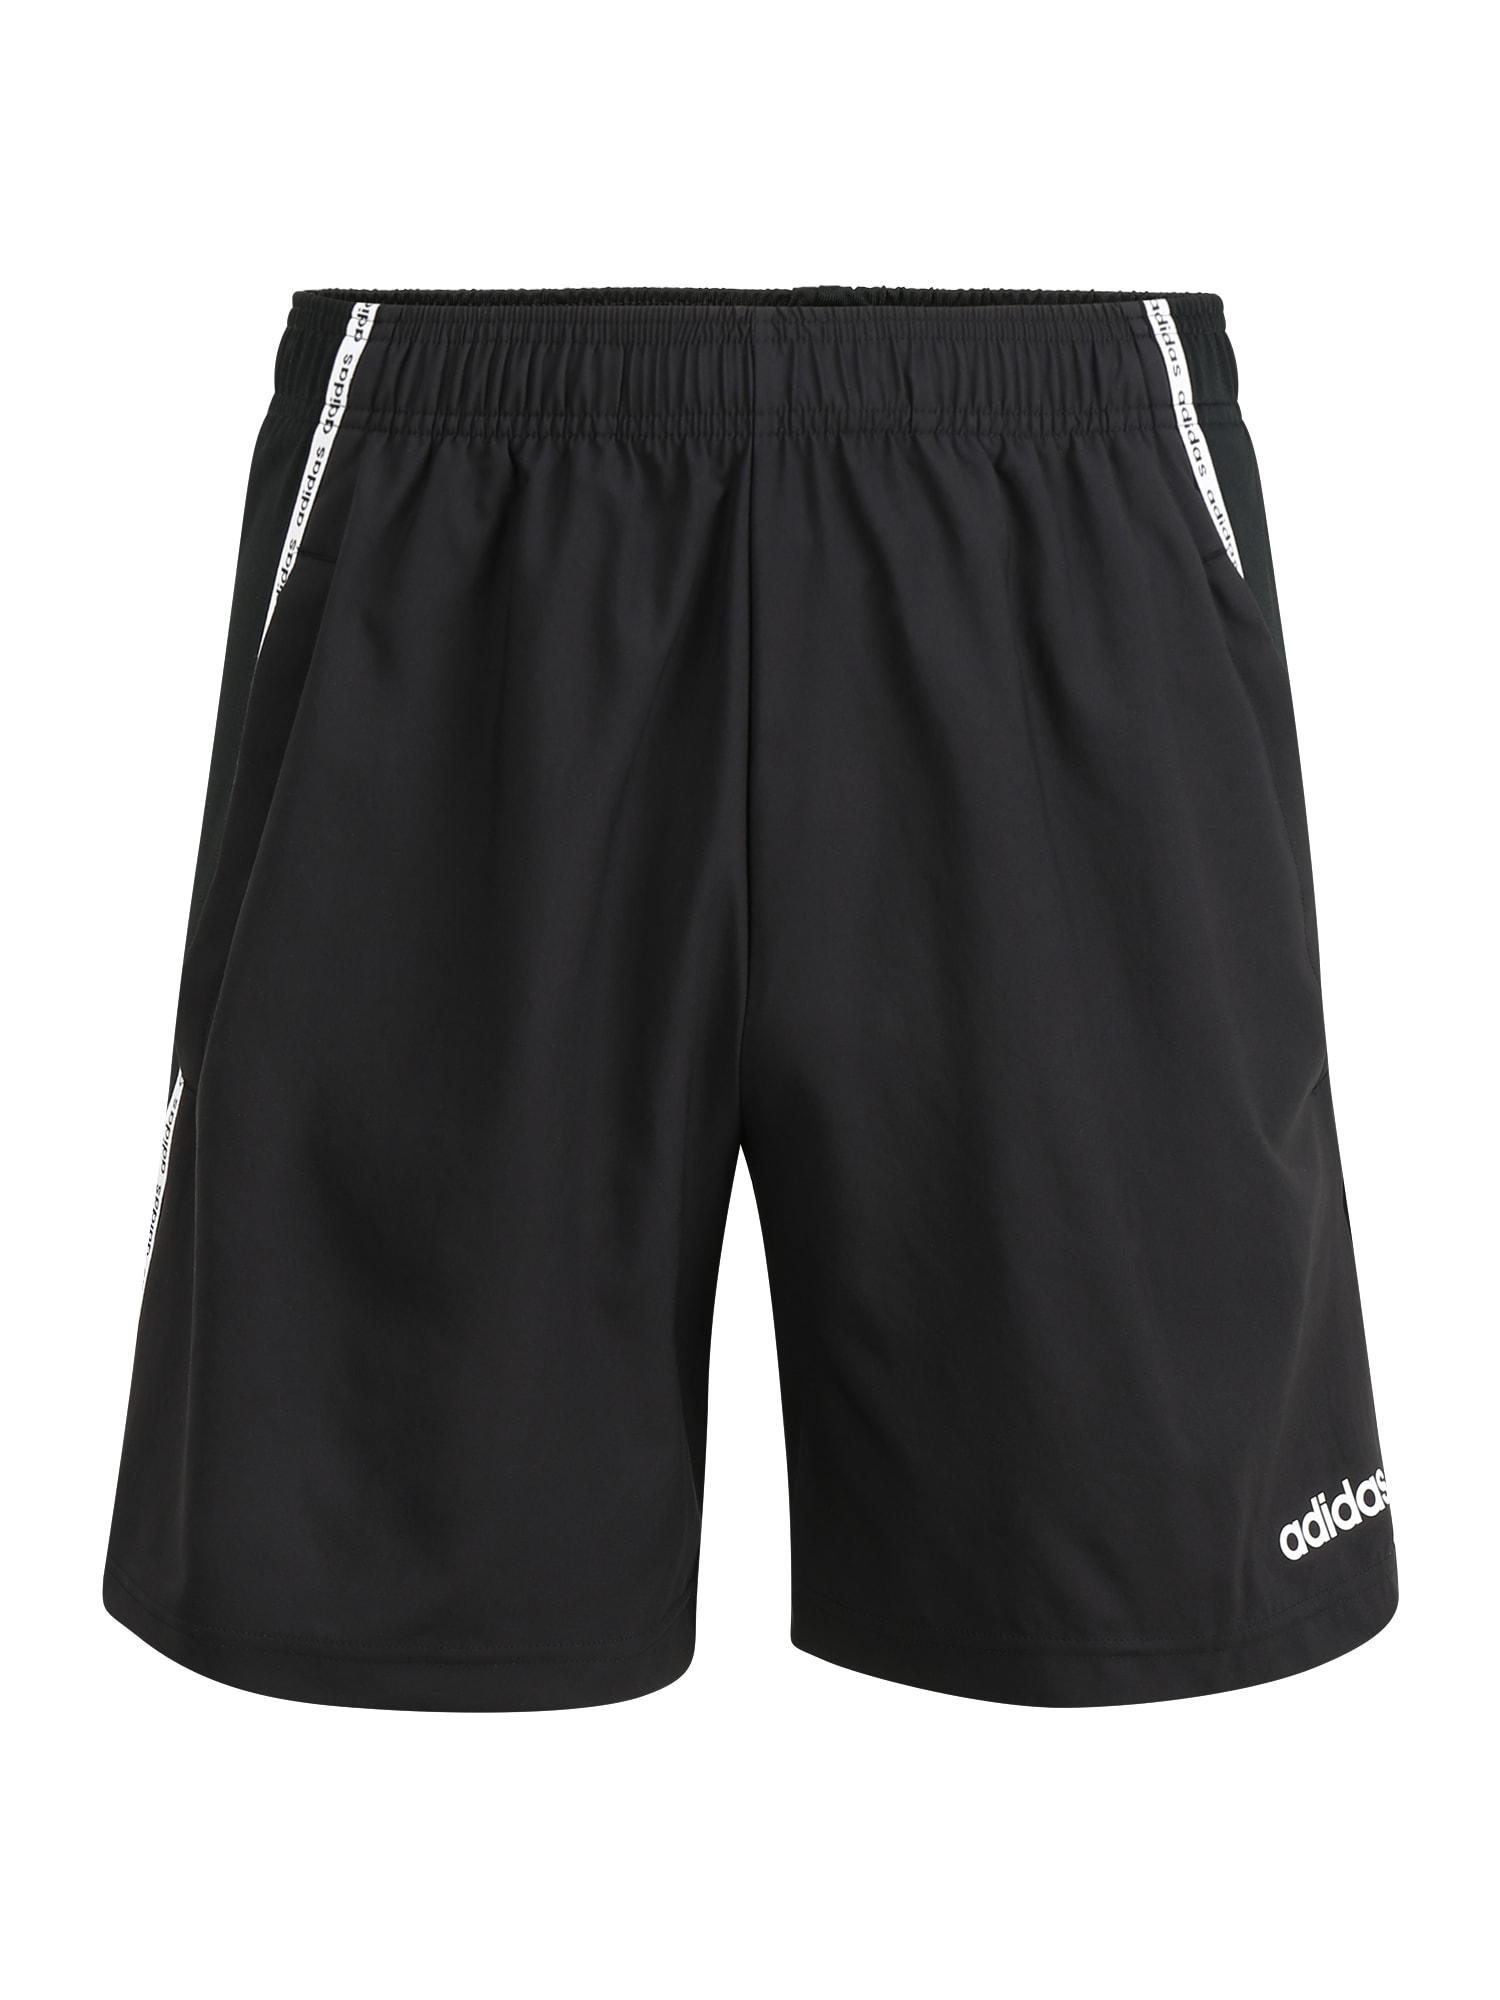 ADIDAS PERFORMANCE Sportinės kelnės 'M D2M MIX SHORT' balta / juoda